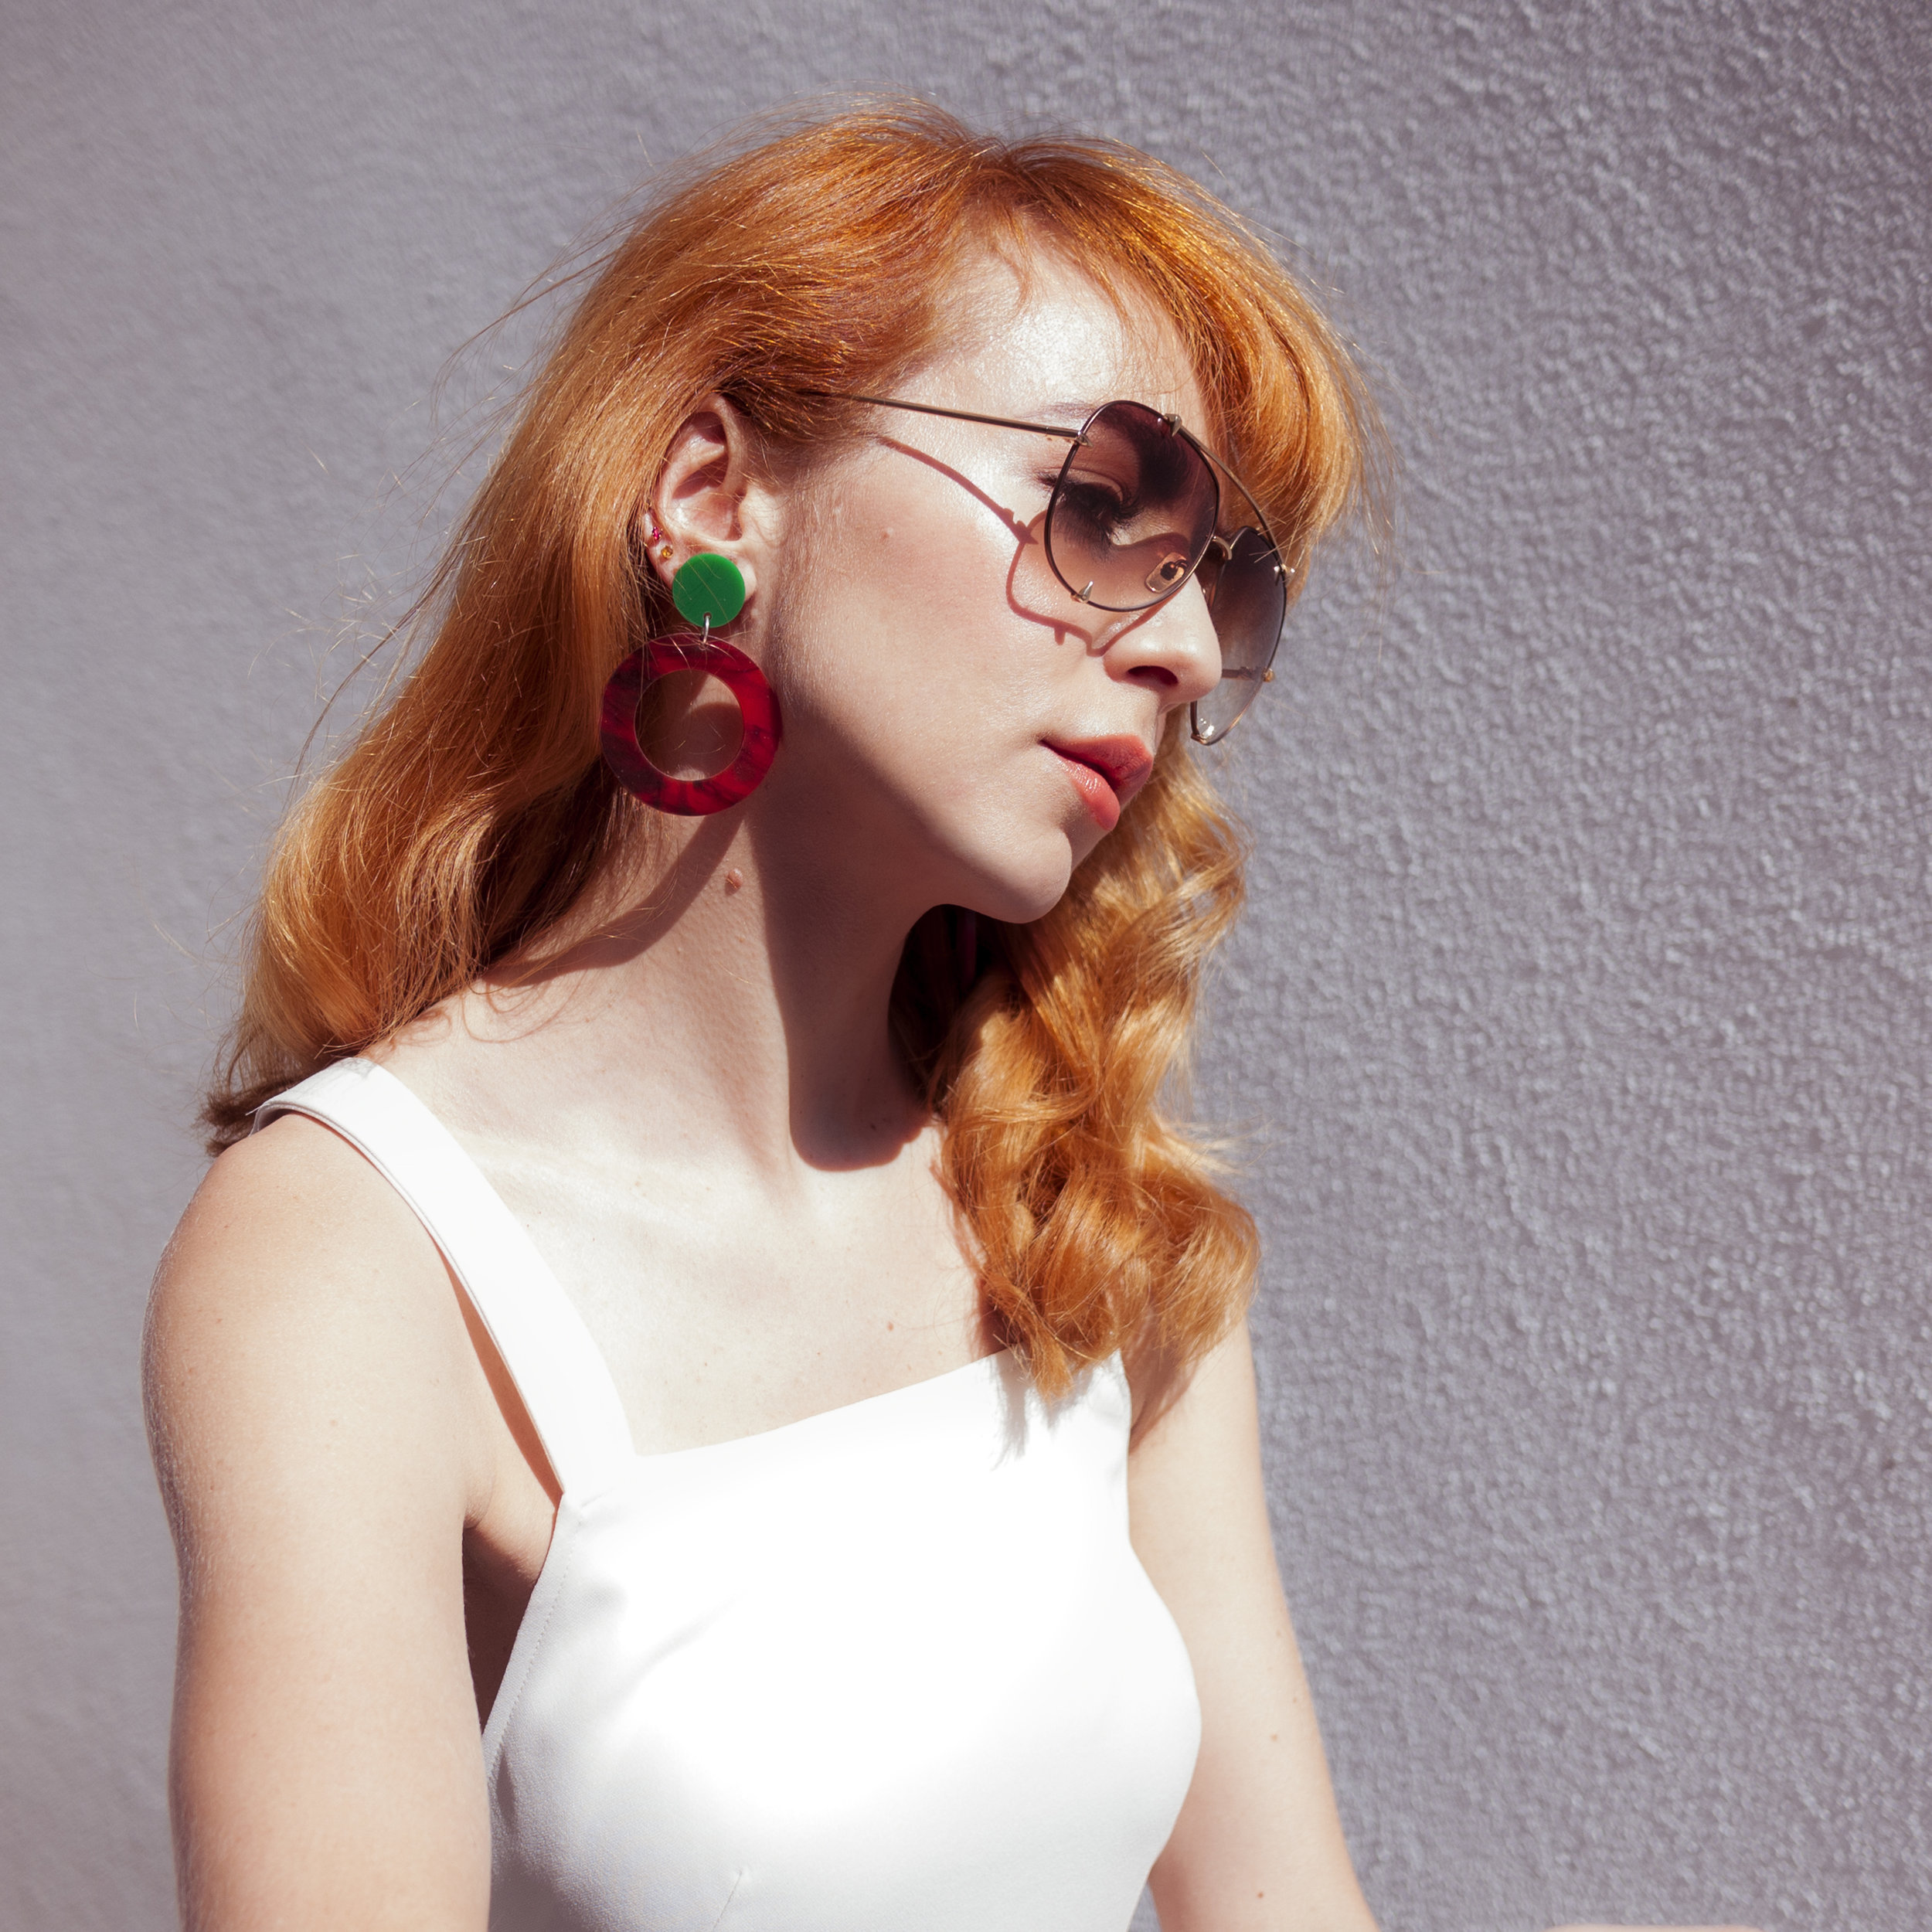 Kelly Thompson blog Melbourne Lucilla Gray hoop earrings www.kellythompsoncreative.com